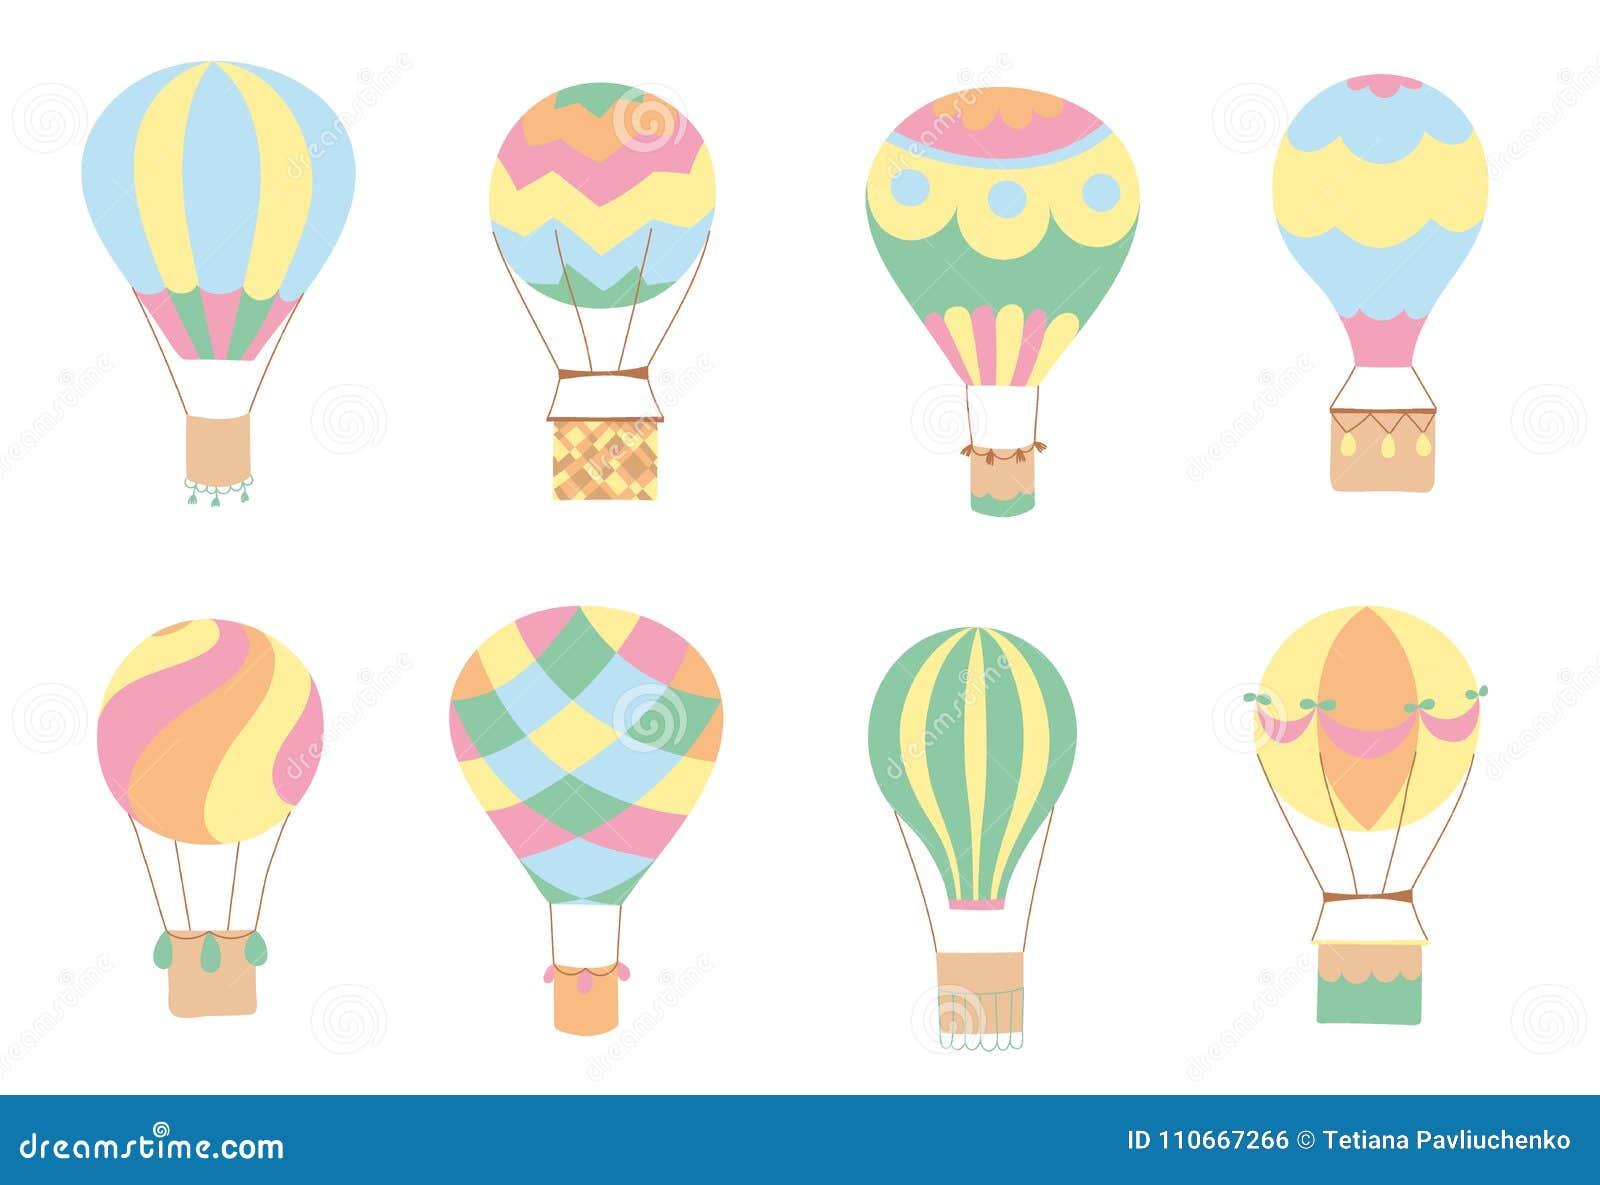 Set Of Vector Hot Air Balloons Stock Vector Illustration Of Outdoor Balloon 110667266